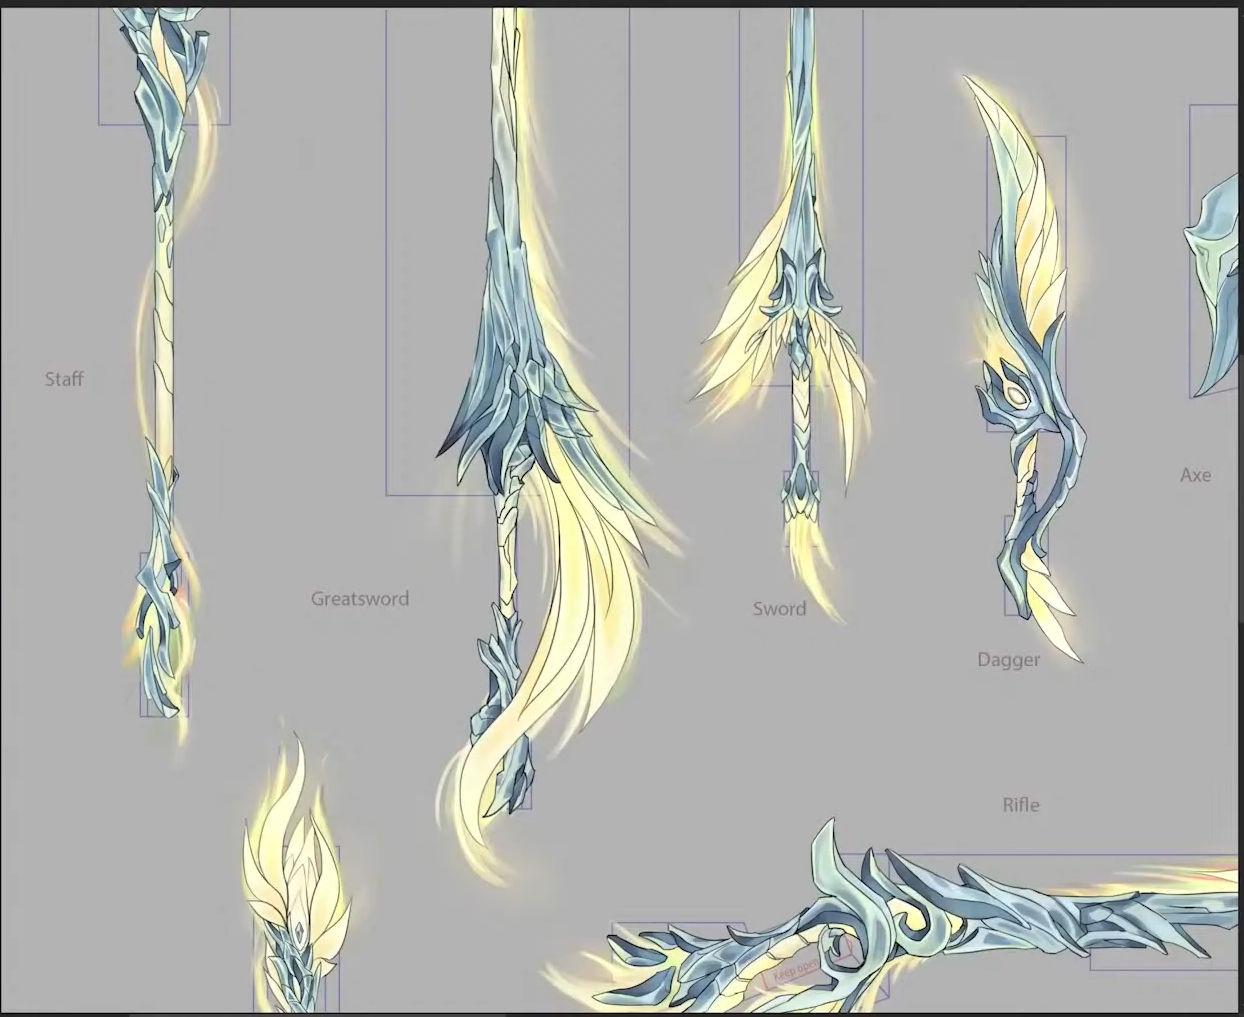 Guild Wars 2 end of dragons GW2 End of Dragons Armi leggendarie nuove